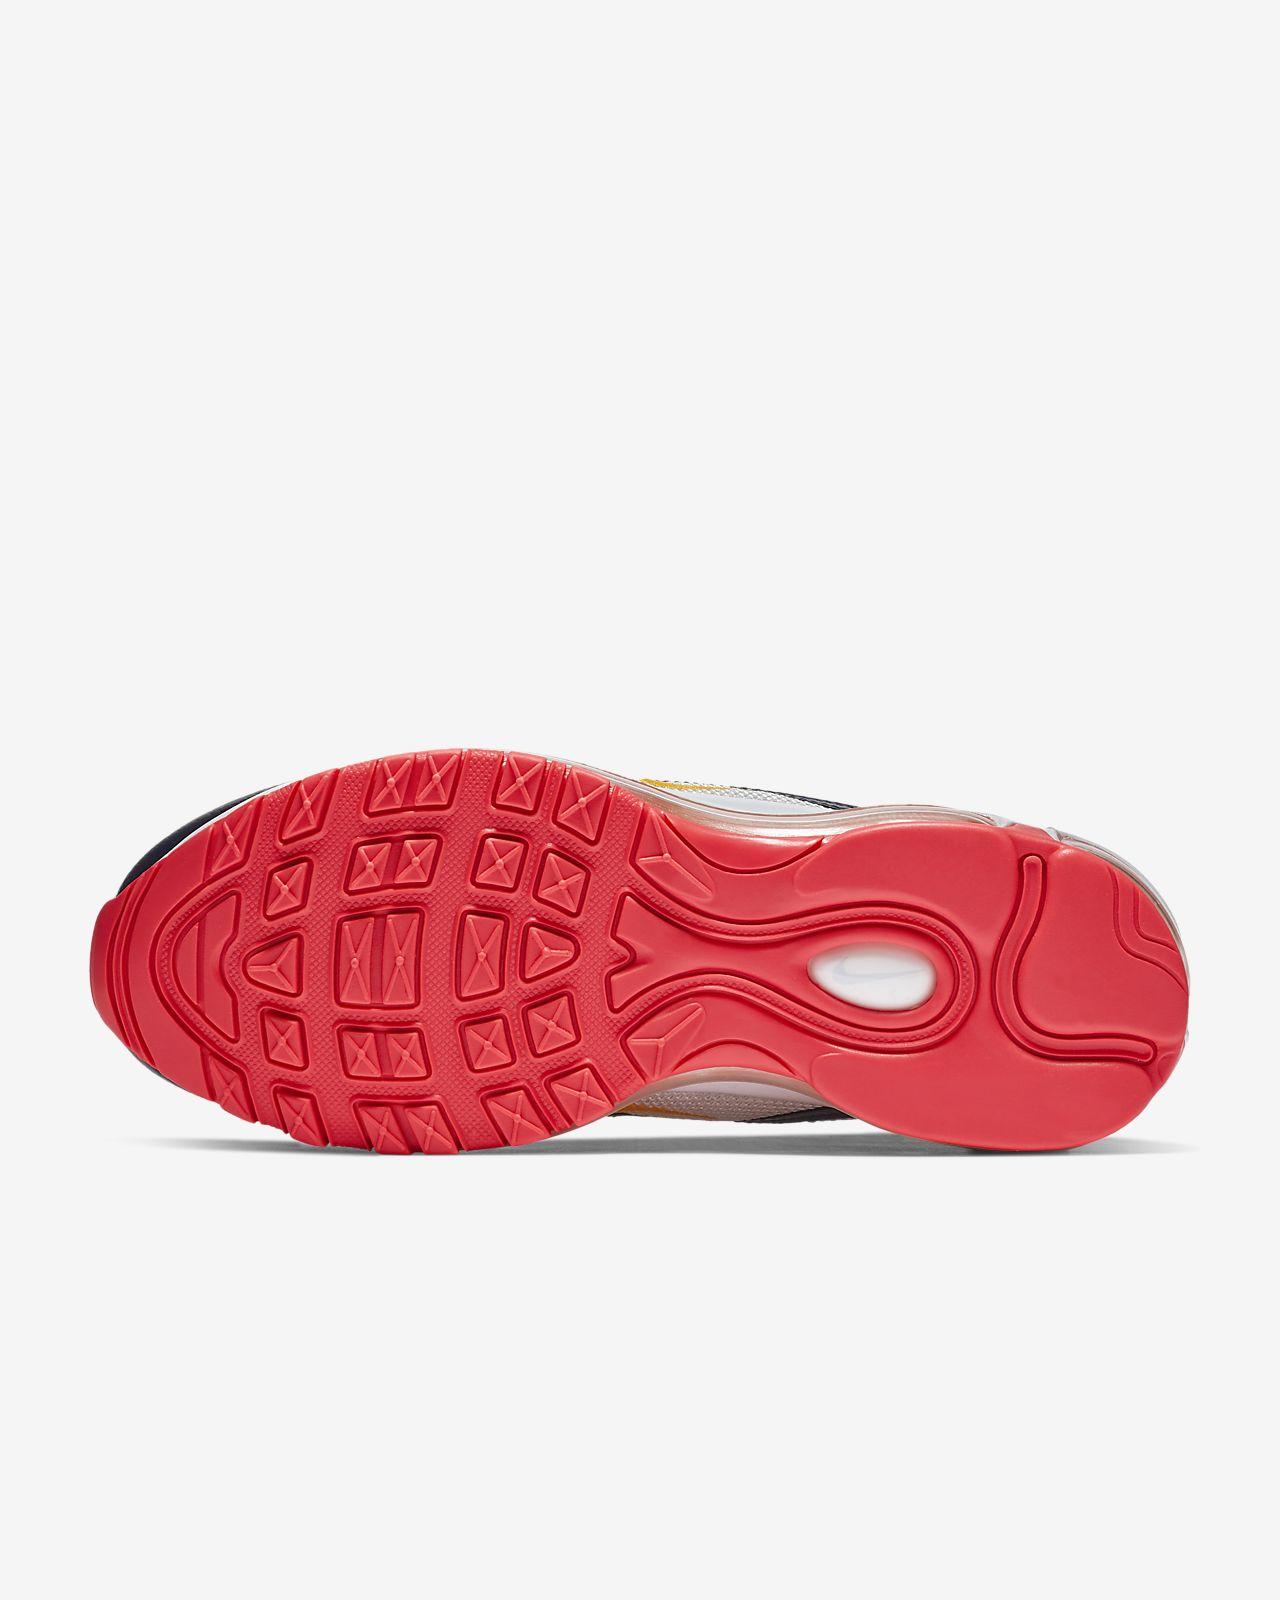 d73923d839a7 Nike Air Max 97 Premium Women s Shoe. Nike.com HU